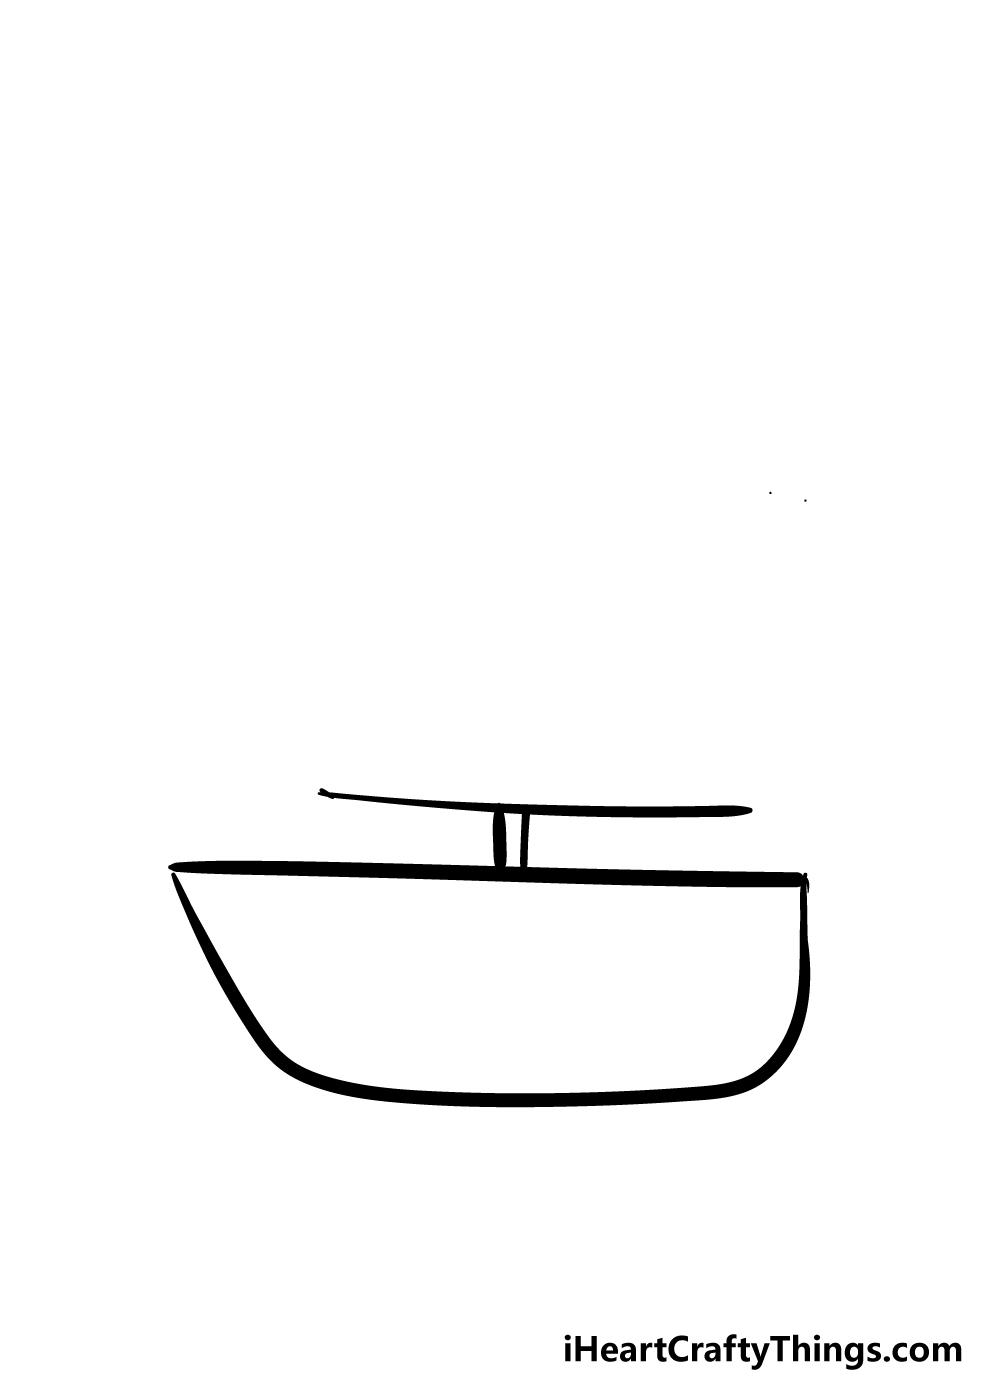 boat drawing step 2